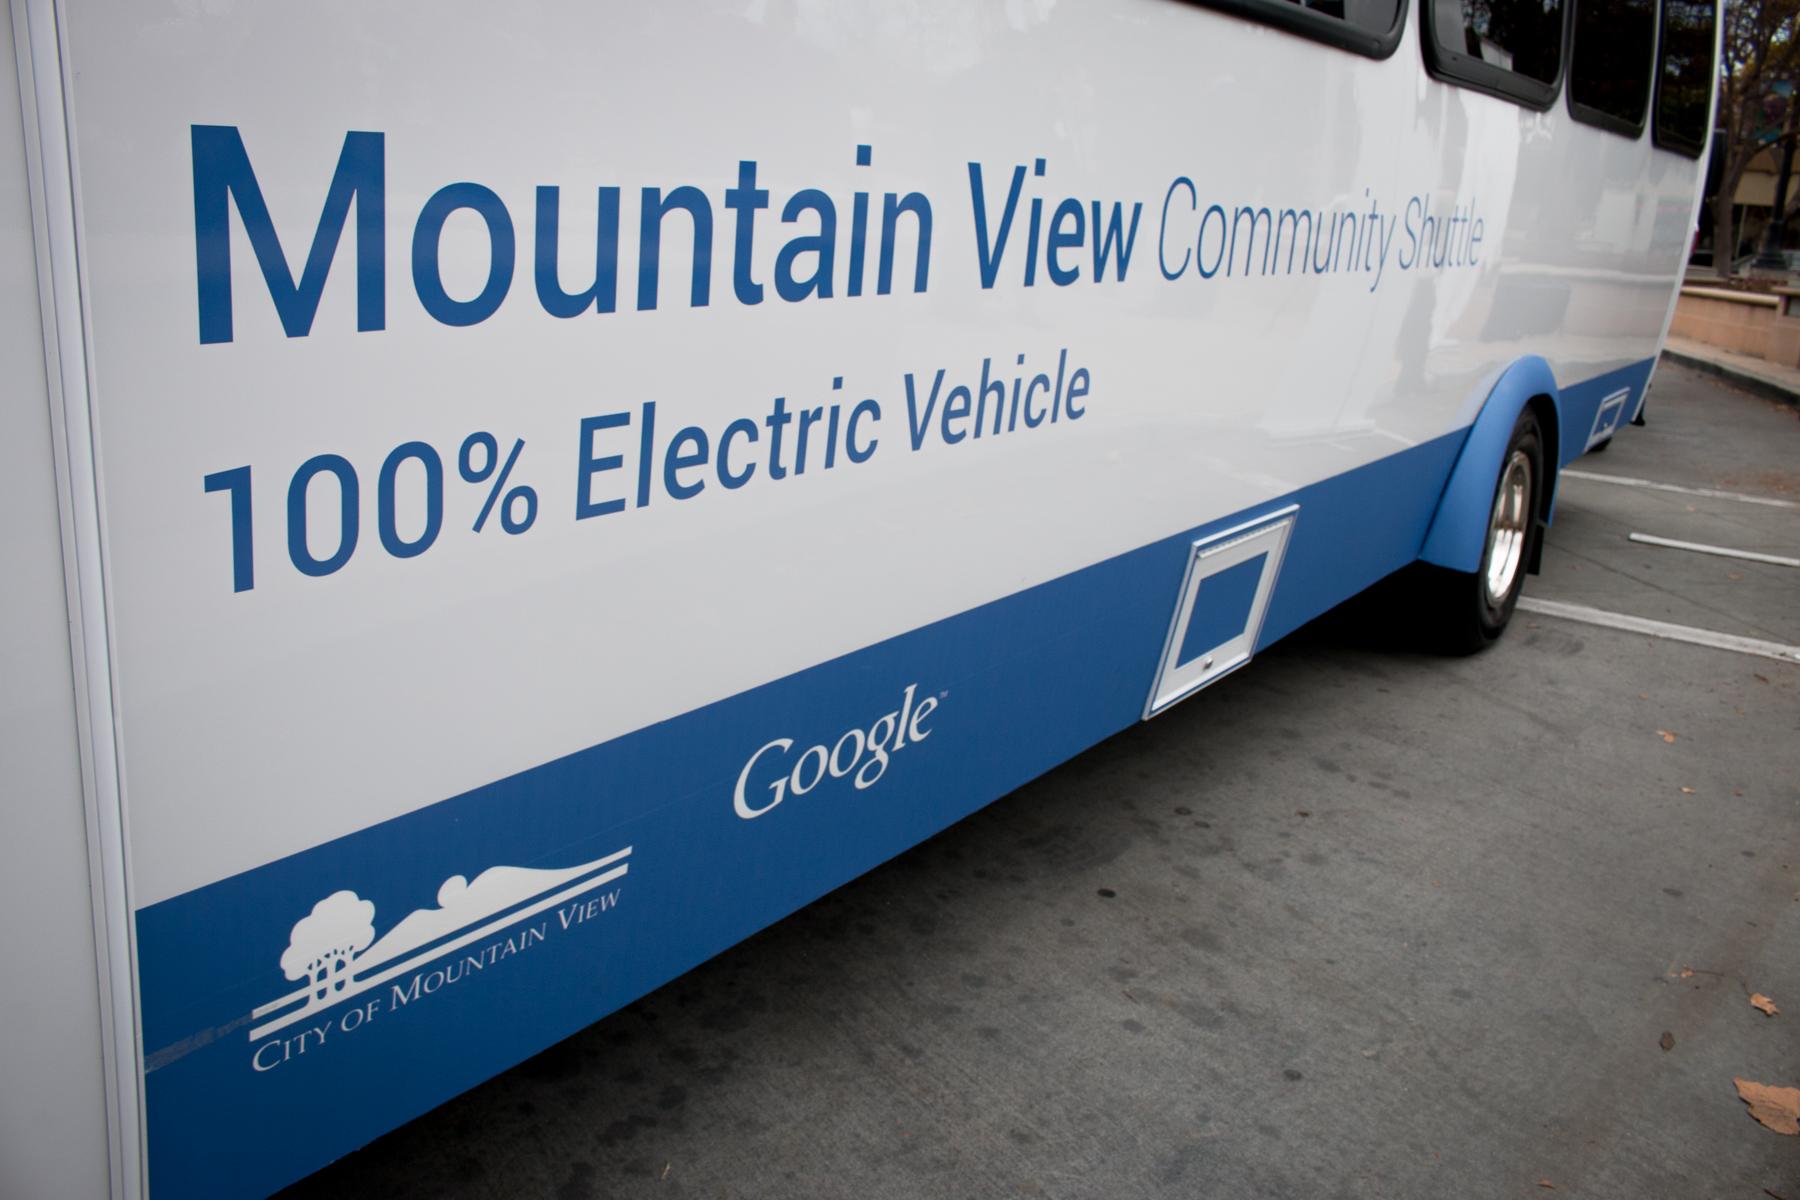 EV Shuttle Buses Deployed in Mountain View, Calif.